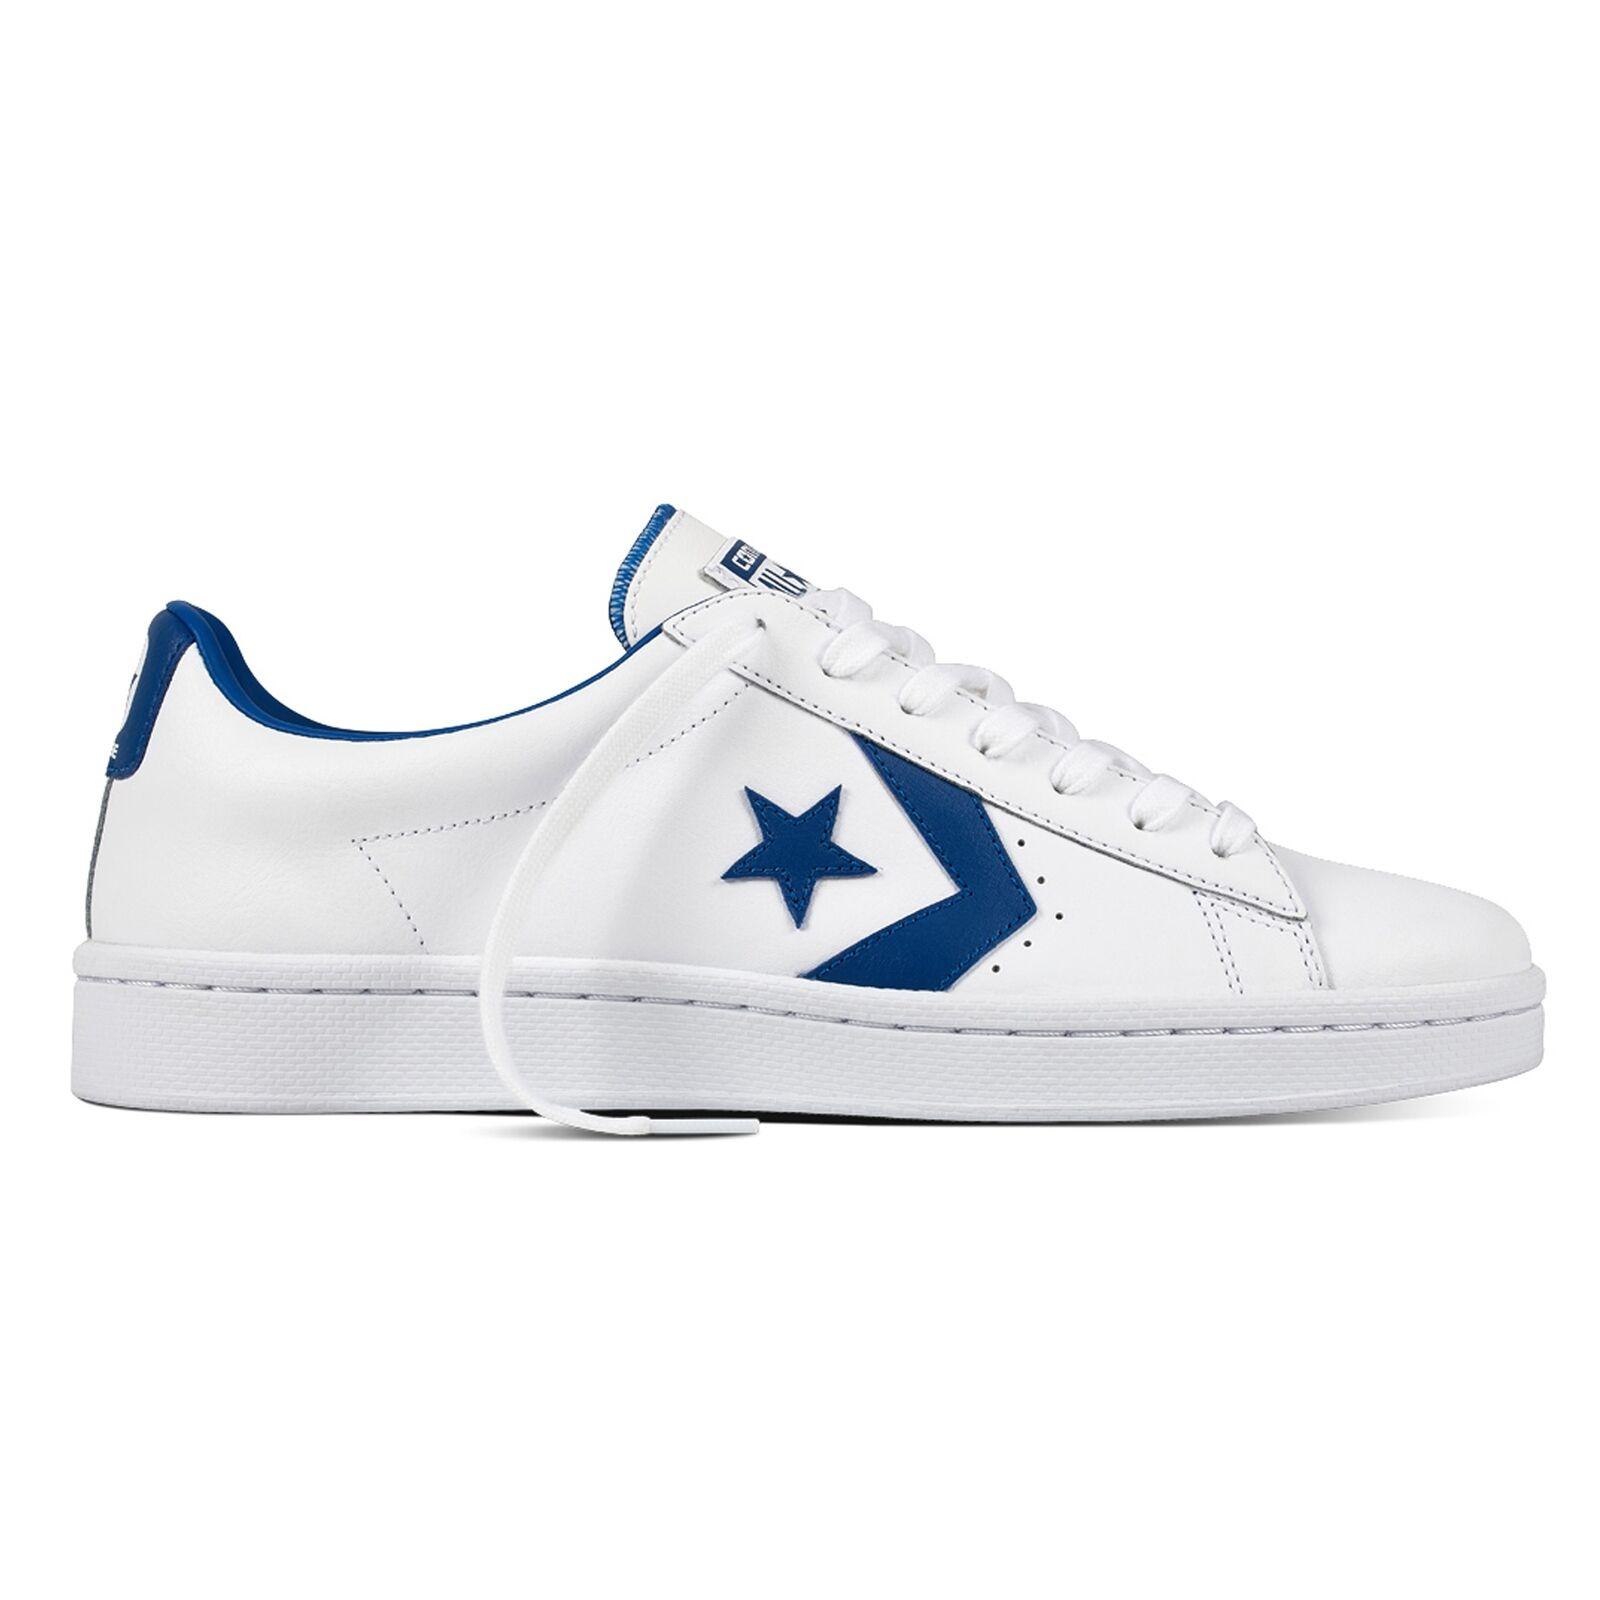 Converse-PL 76 OX 157807c White/Blue White/Blue 157807c Jay/White 23d956